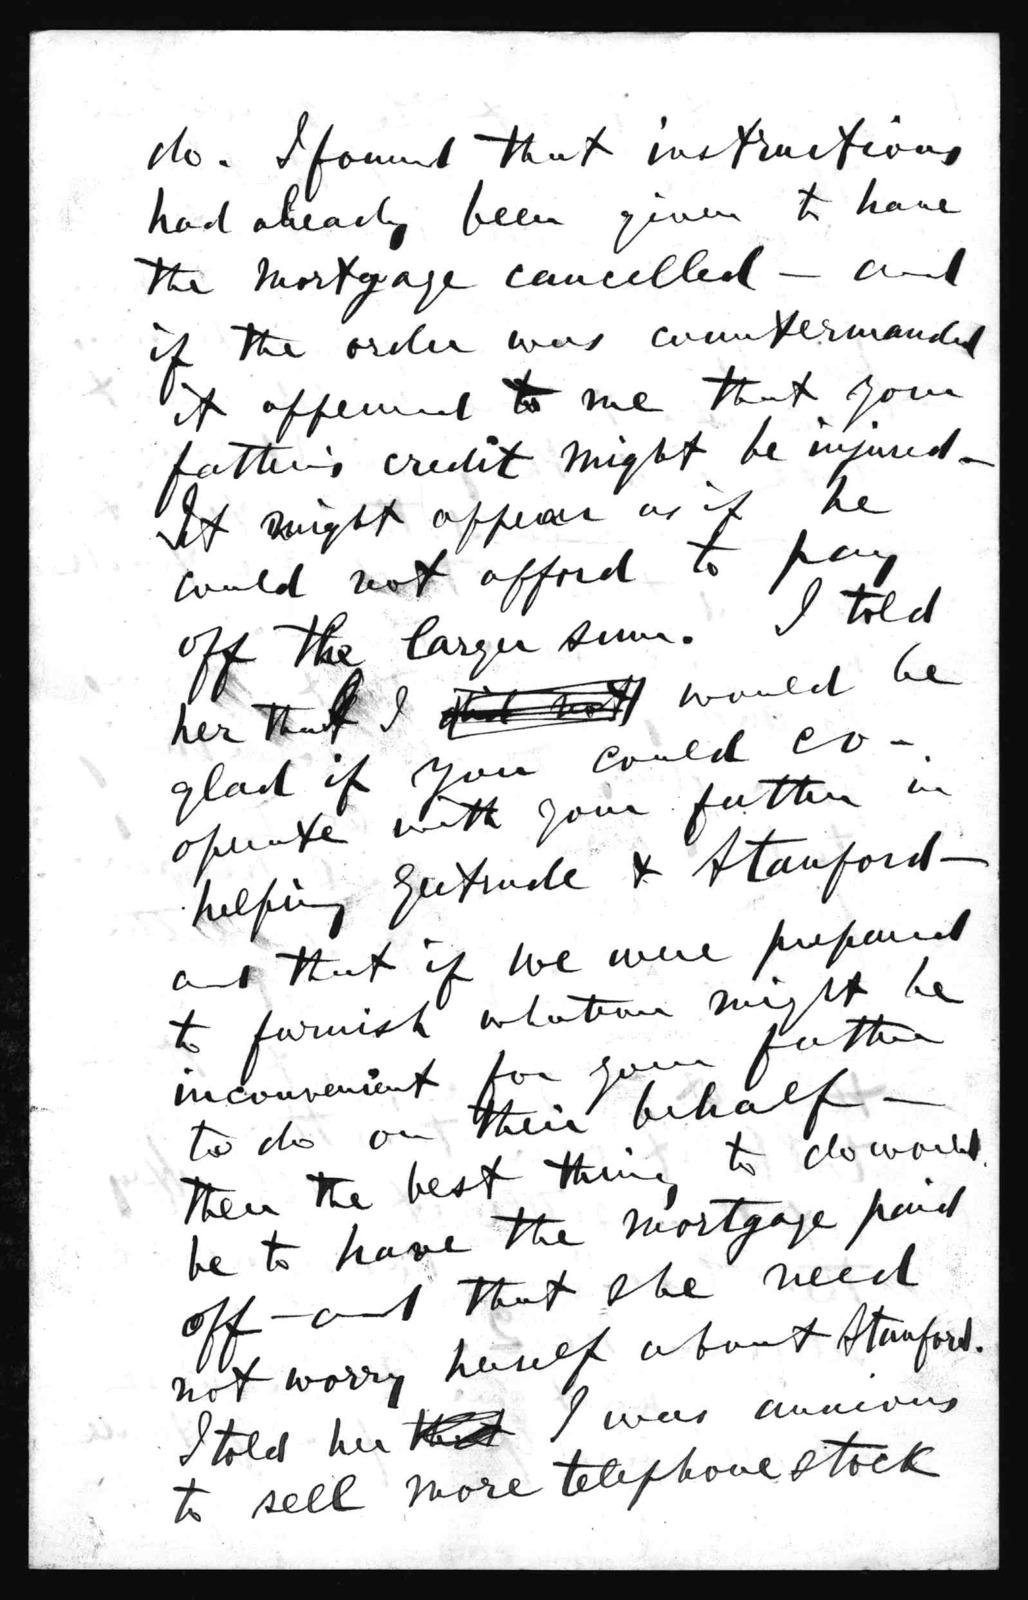 Letter from Alexander Graham Bell to Mabel Hubbard Bell, September 24, 1881